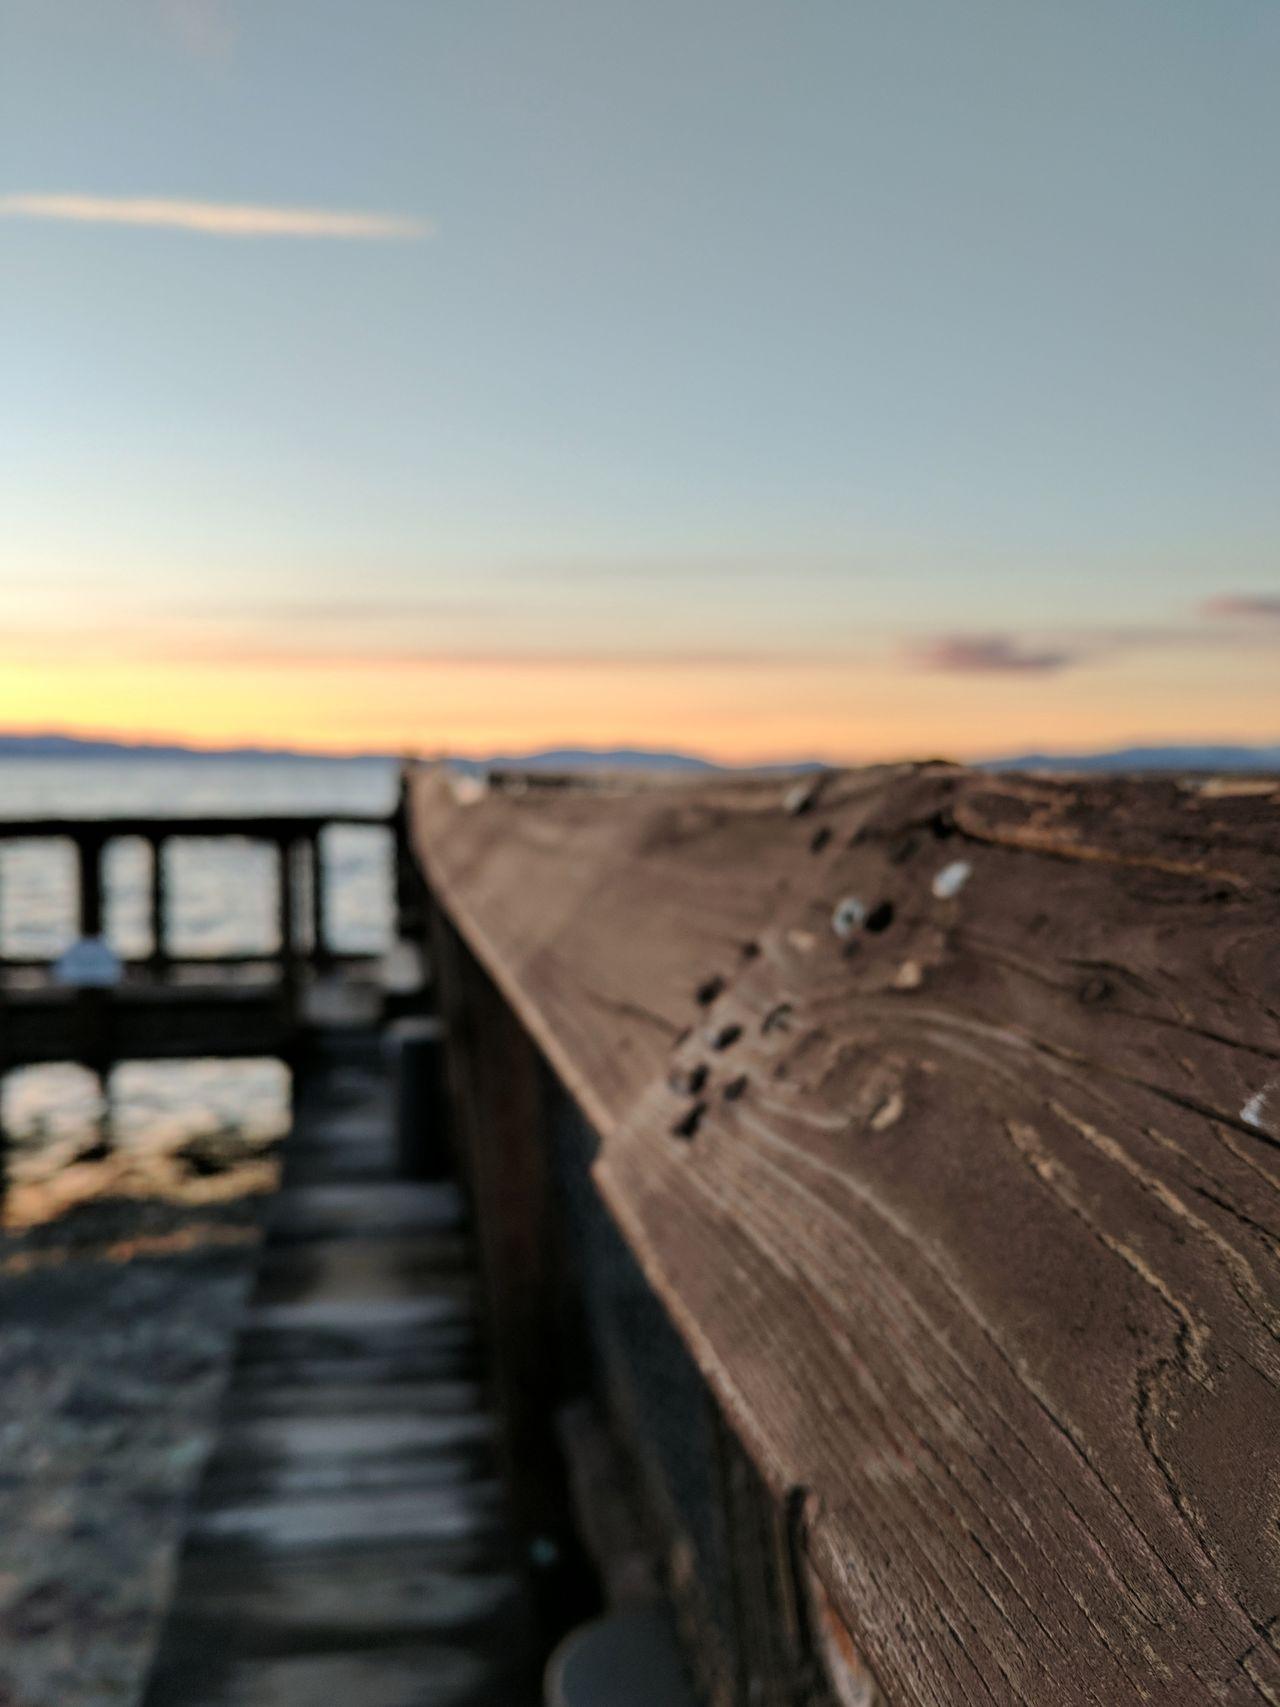 Close-up Outdoors Sunset Boardwalk Summer Water Travel Destinations Scenics Horizon Over Water Lake Tahoe California United States